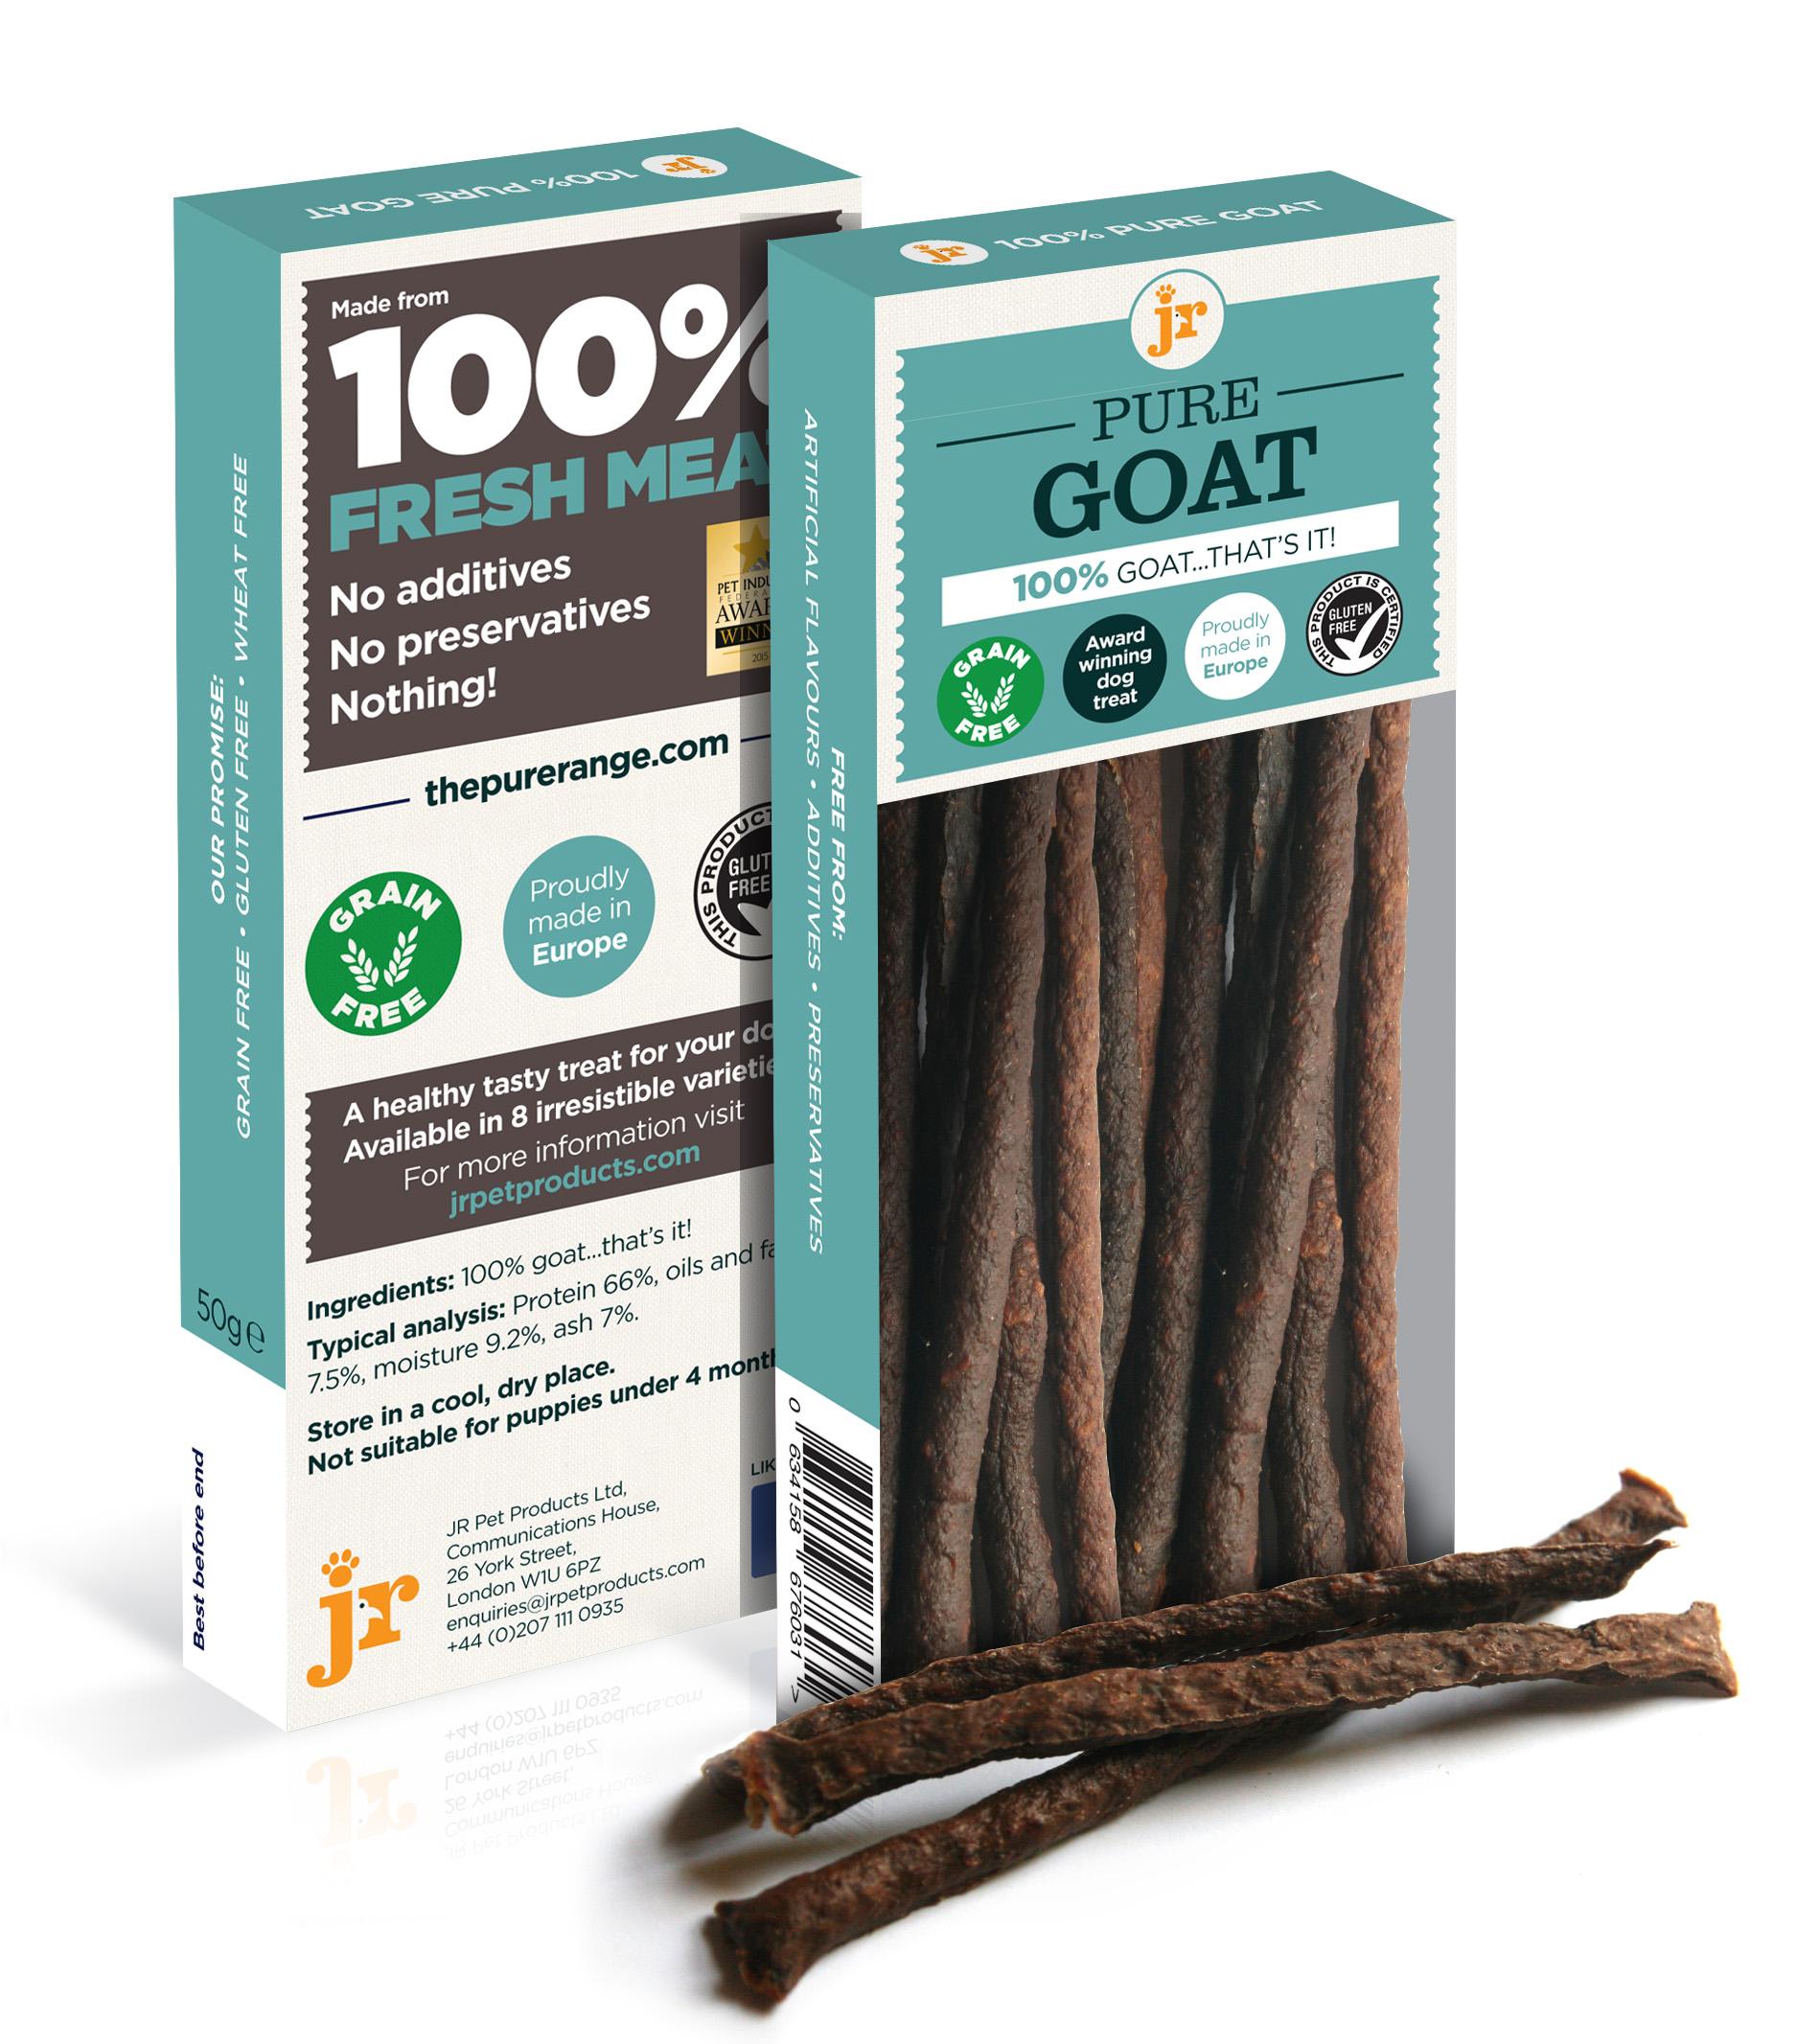 Goat-box-1.jpg